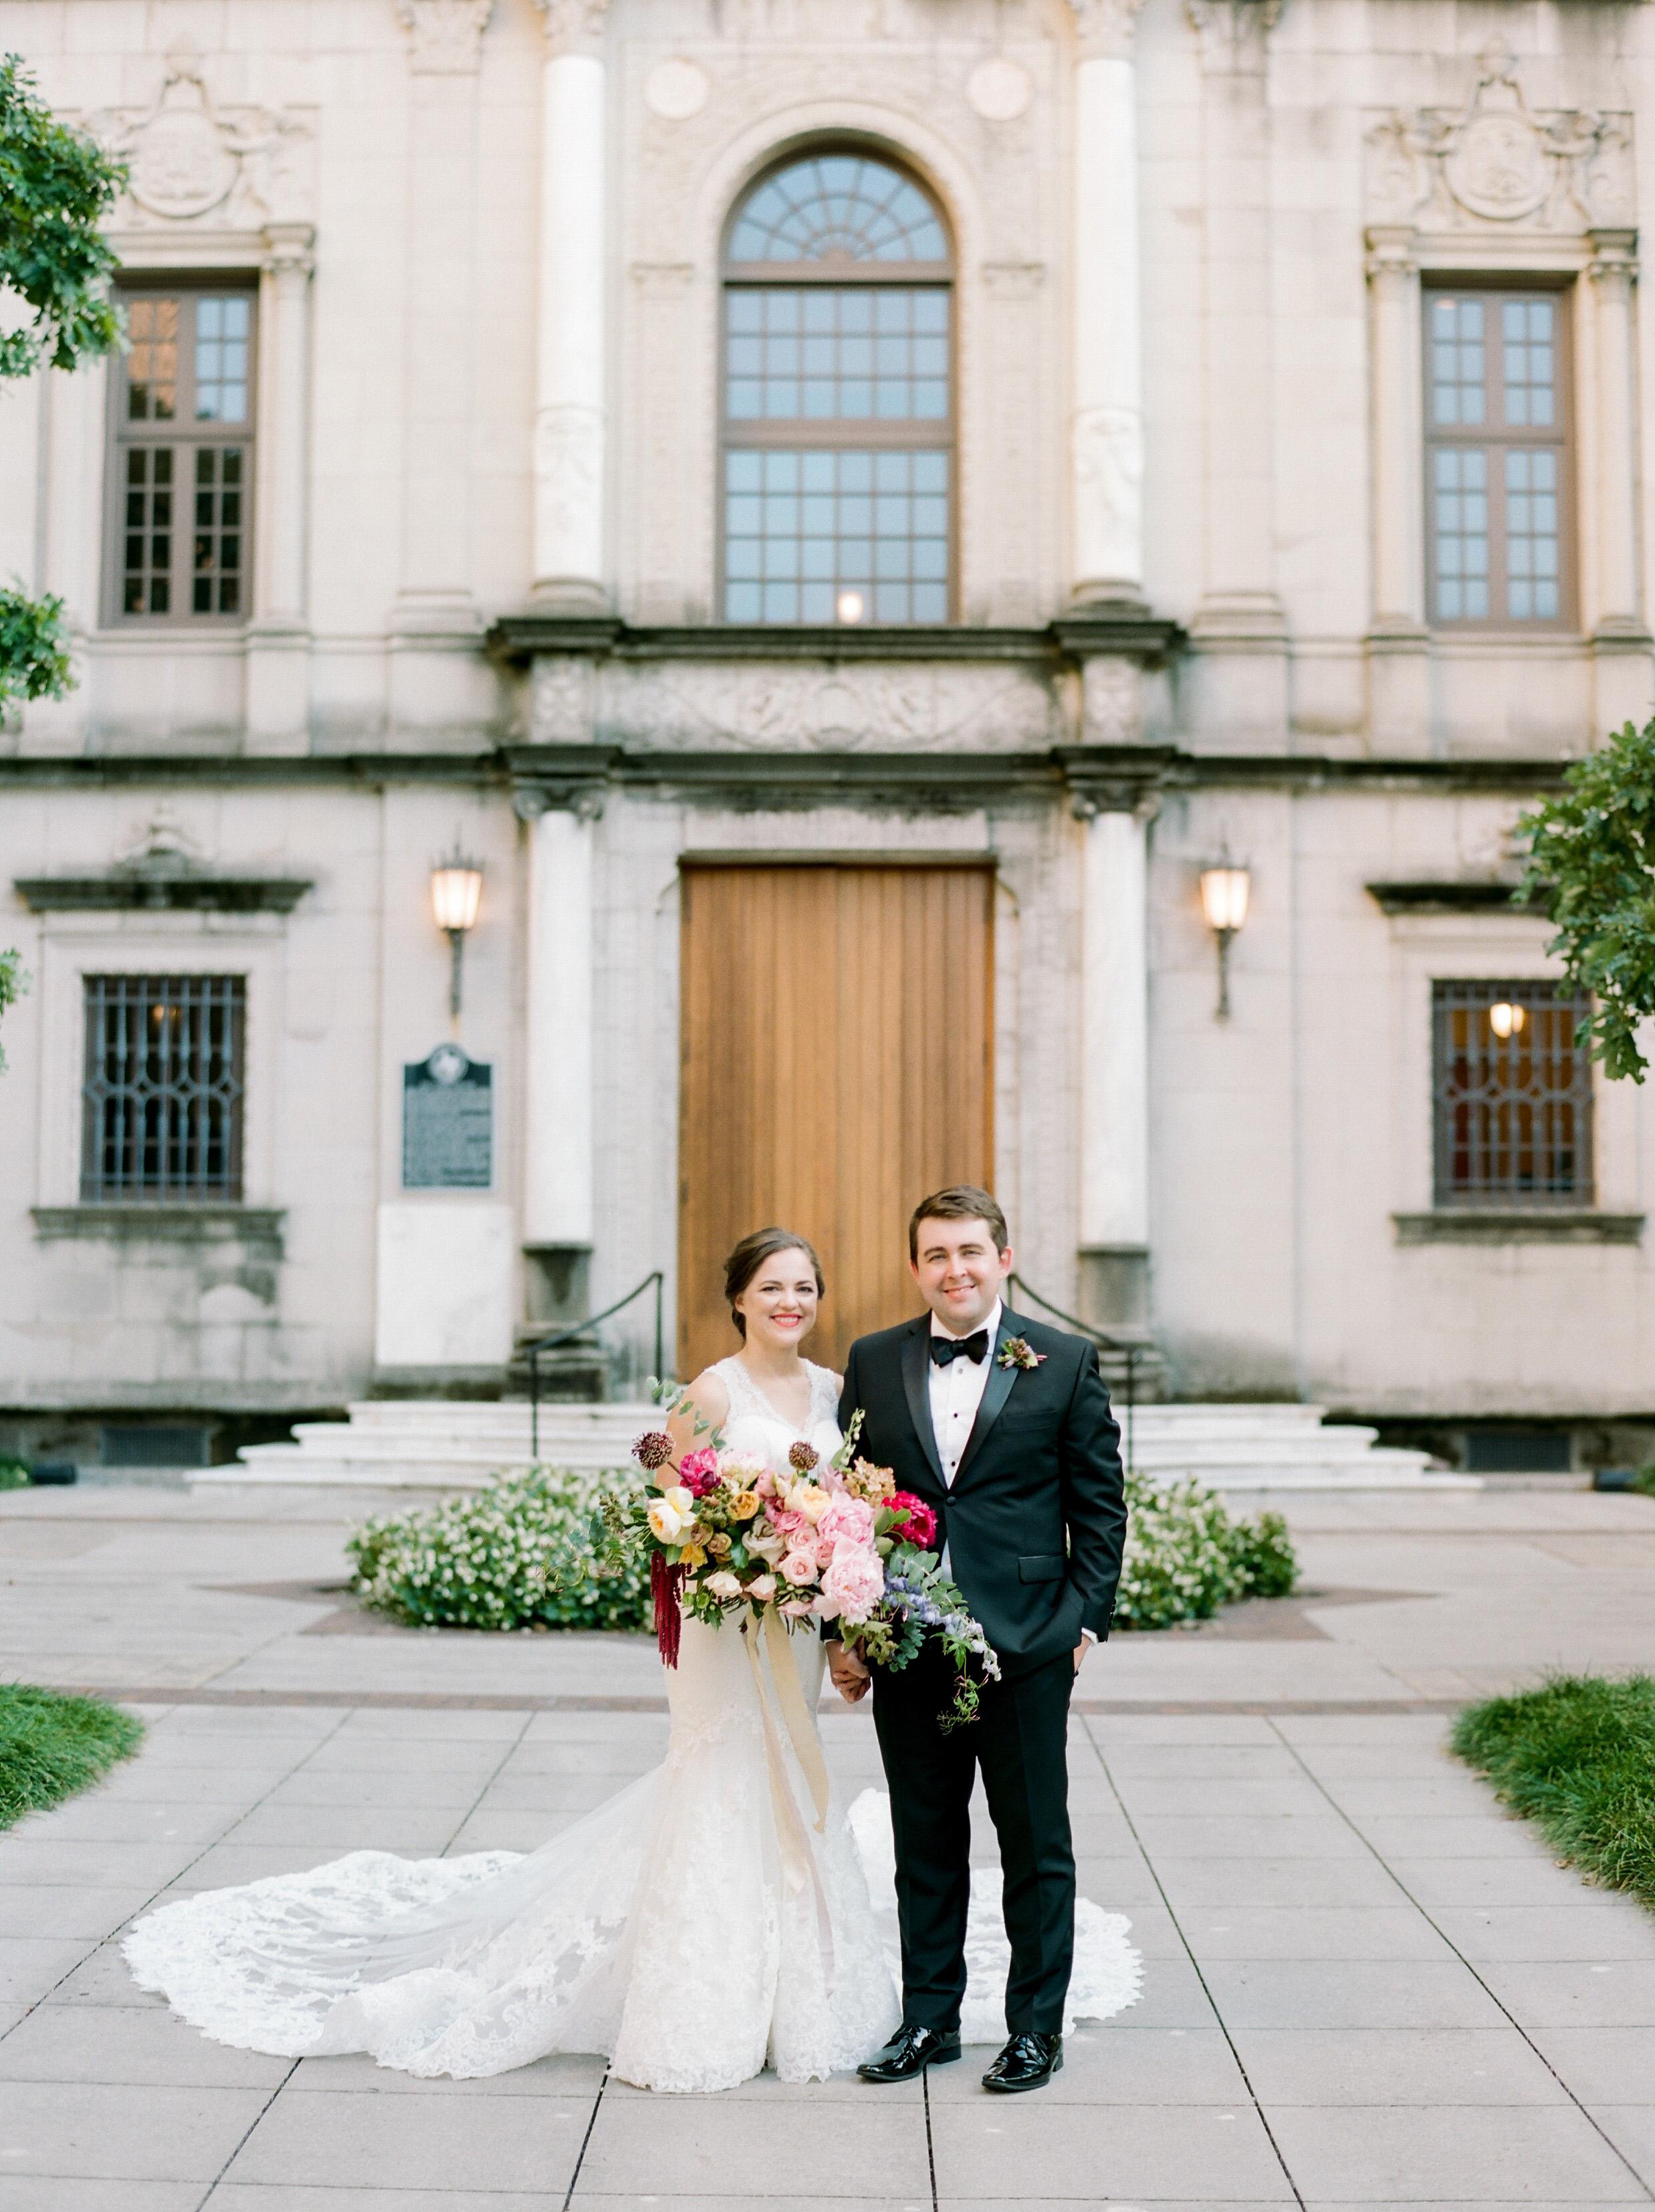 The-Knot-Texas-Fine-Art-Wedding-Film-Destination-Photographer-Houston-Austin-Dallas-New-Orleans-Julia-Ideson-Library-Event-Dana-Josh-Fernandez-Photograph-Top-Best-42.jpg